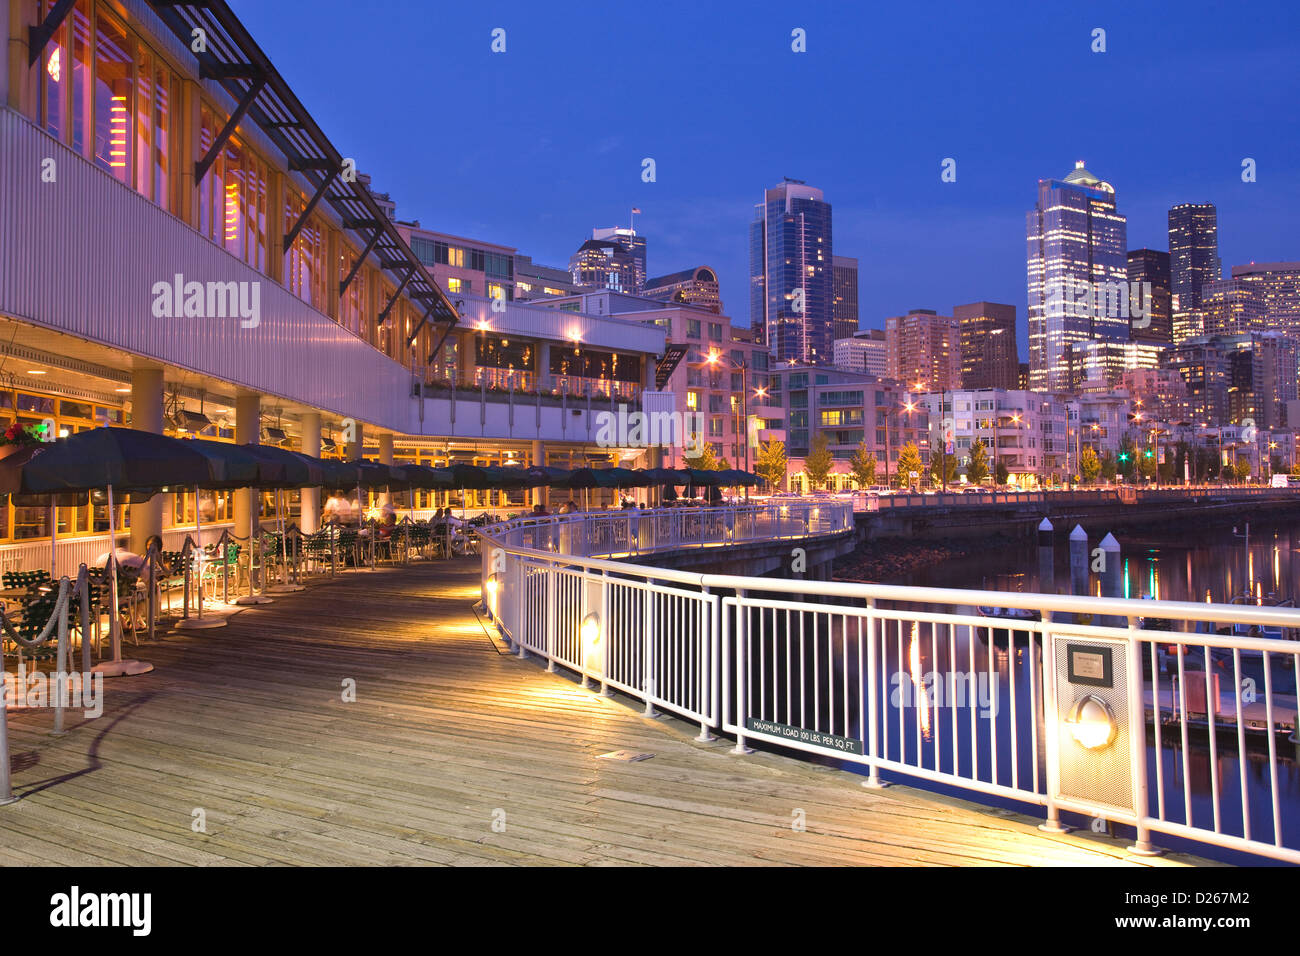 Outdoor Restaurants Pier 66 Bell Street Marina Elliot Bay Downtown